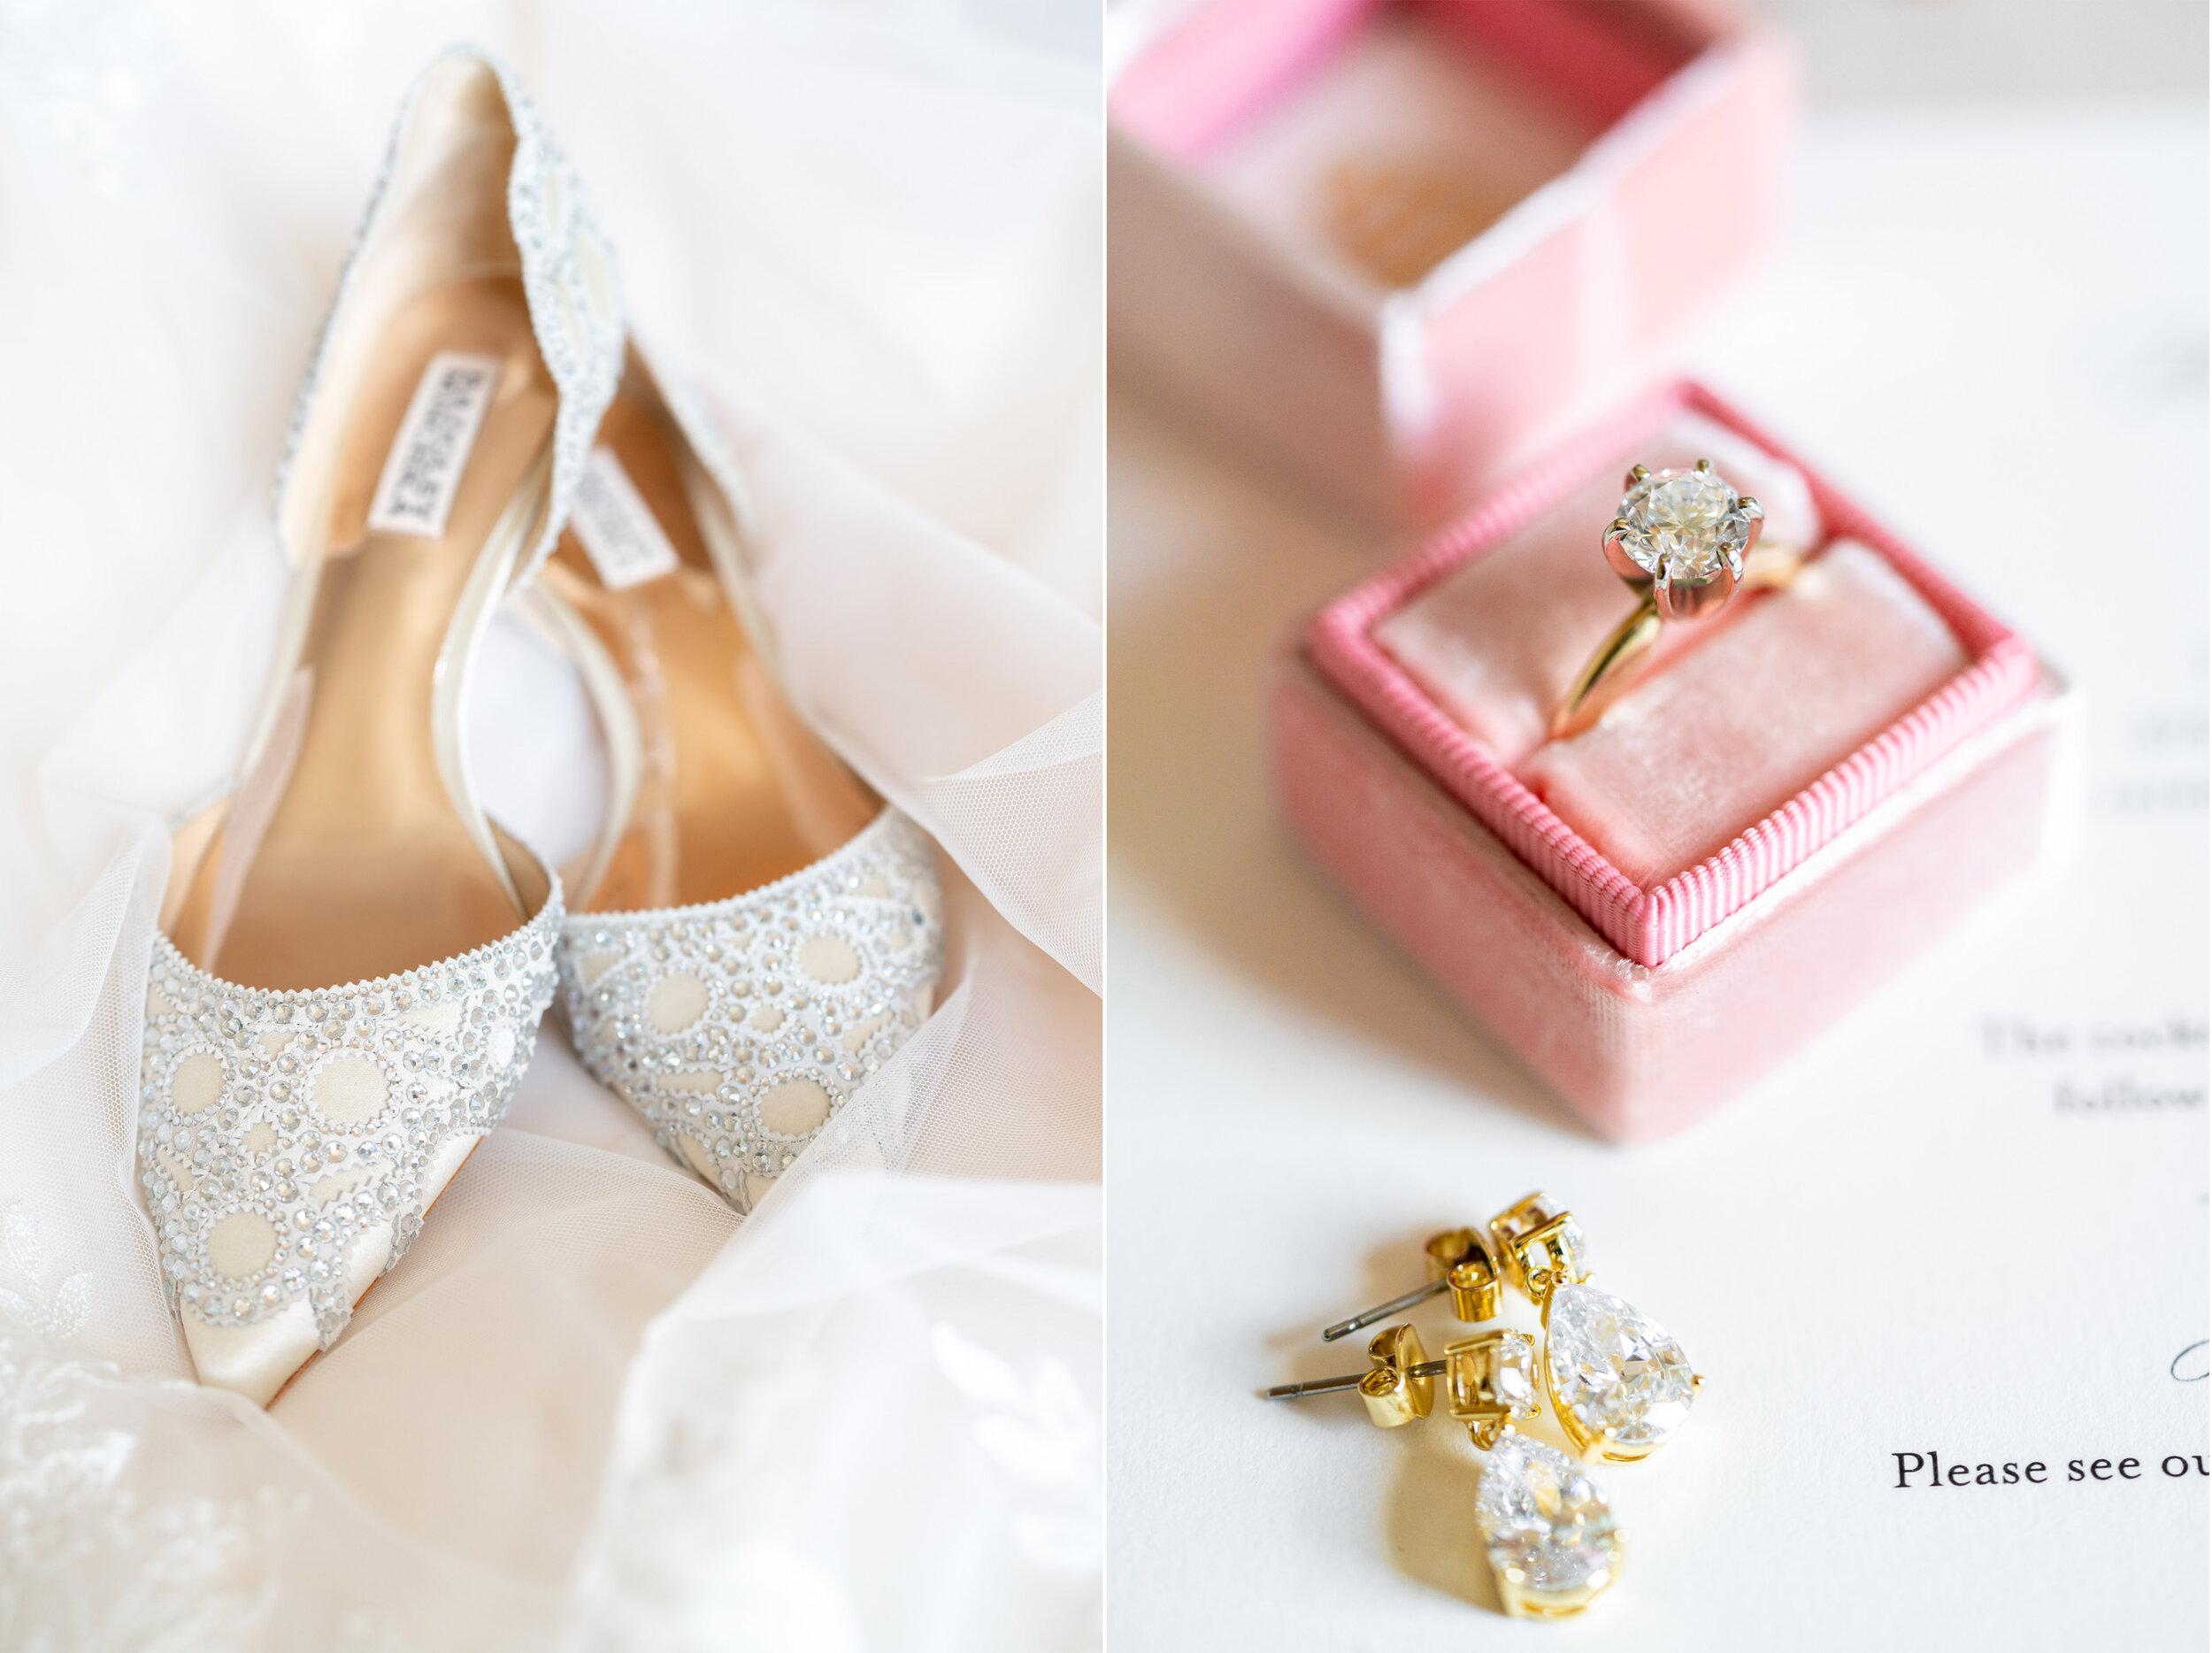 Badgley Mishka gigi flats and pink Gwynevere Mrs box wedding details